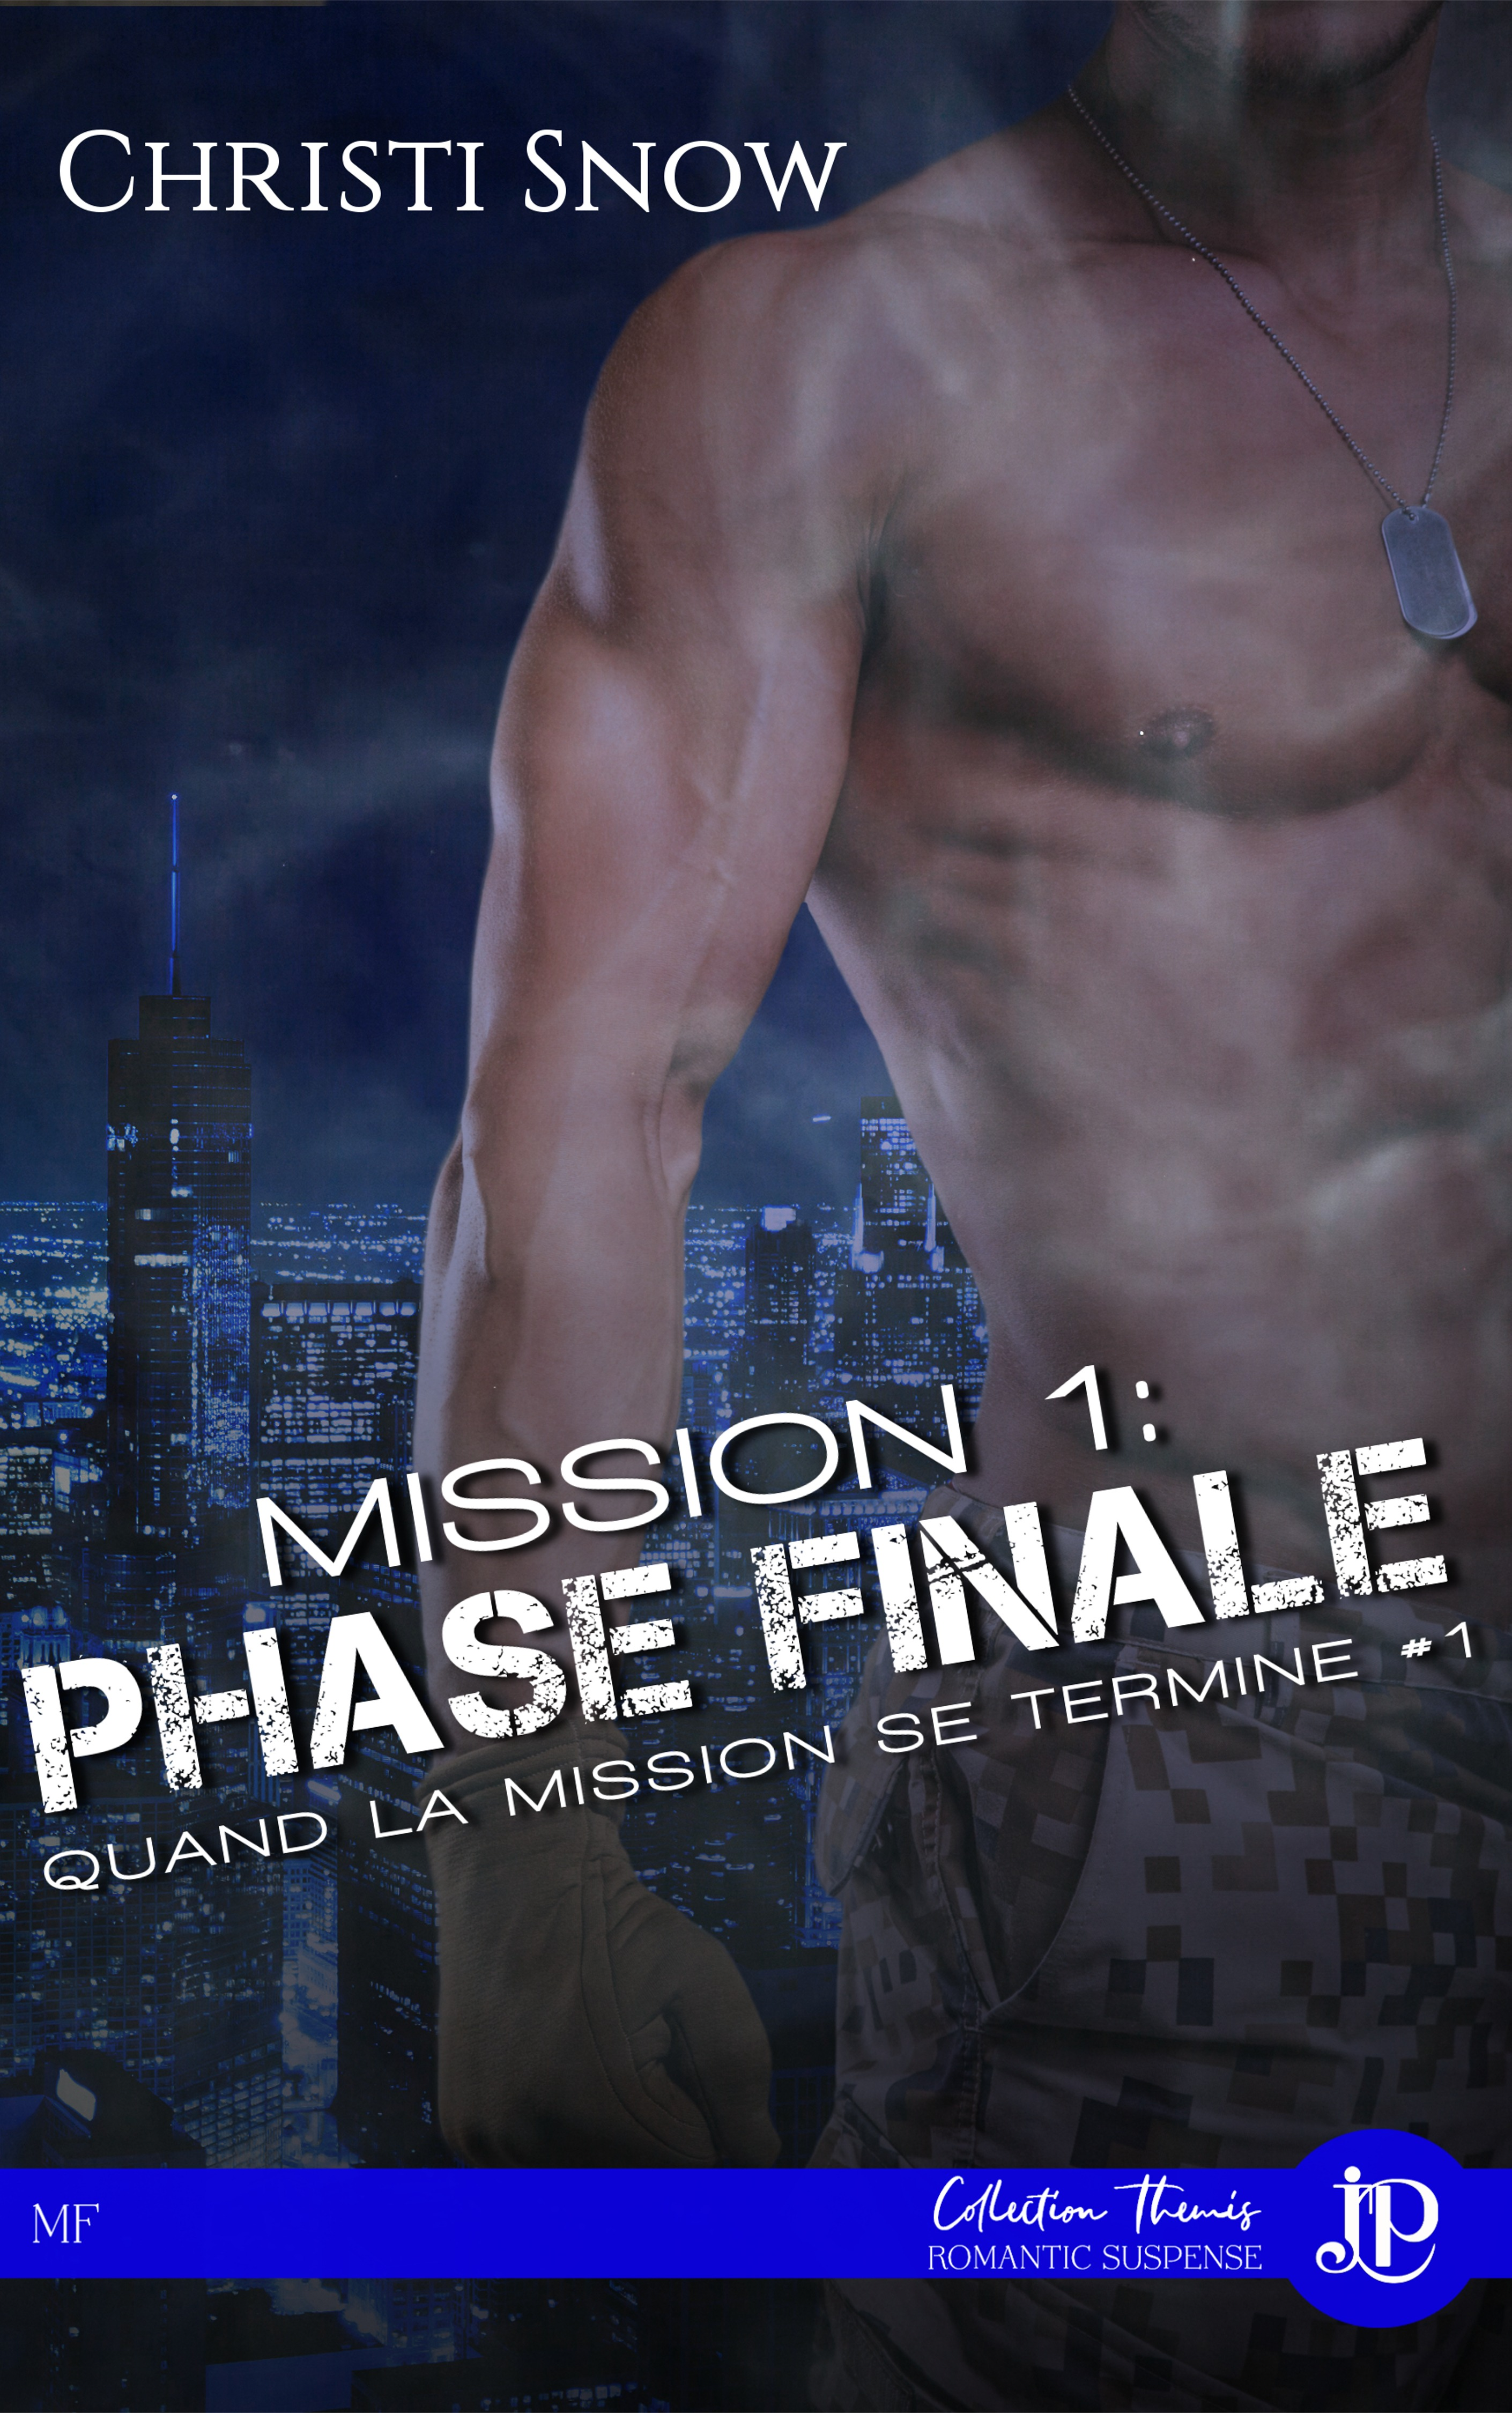 Mission 1 : Phase Finale, QUAND LA MISSION SE TERMINE